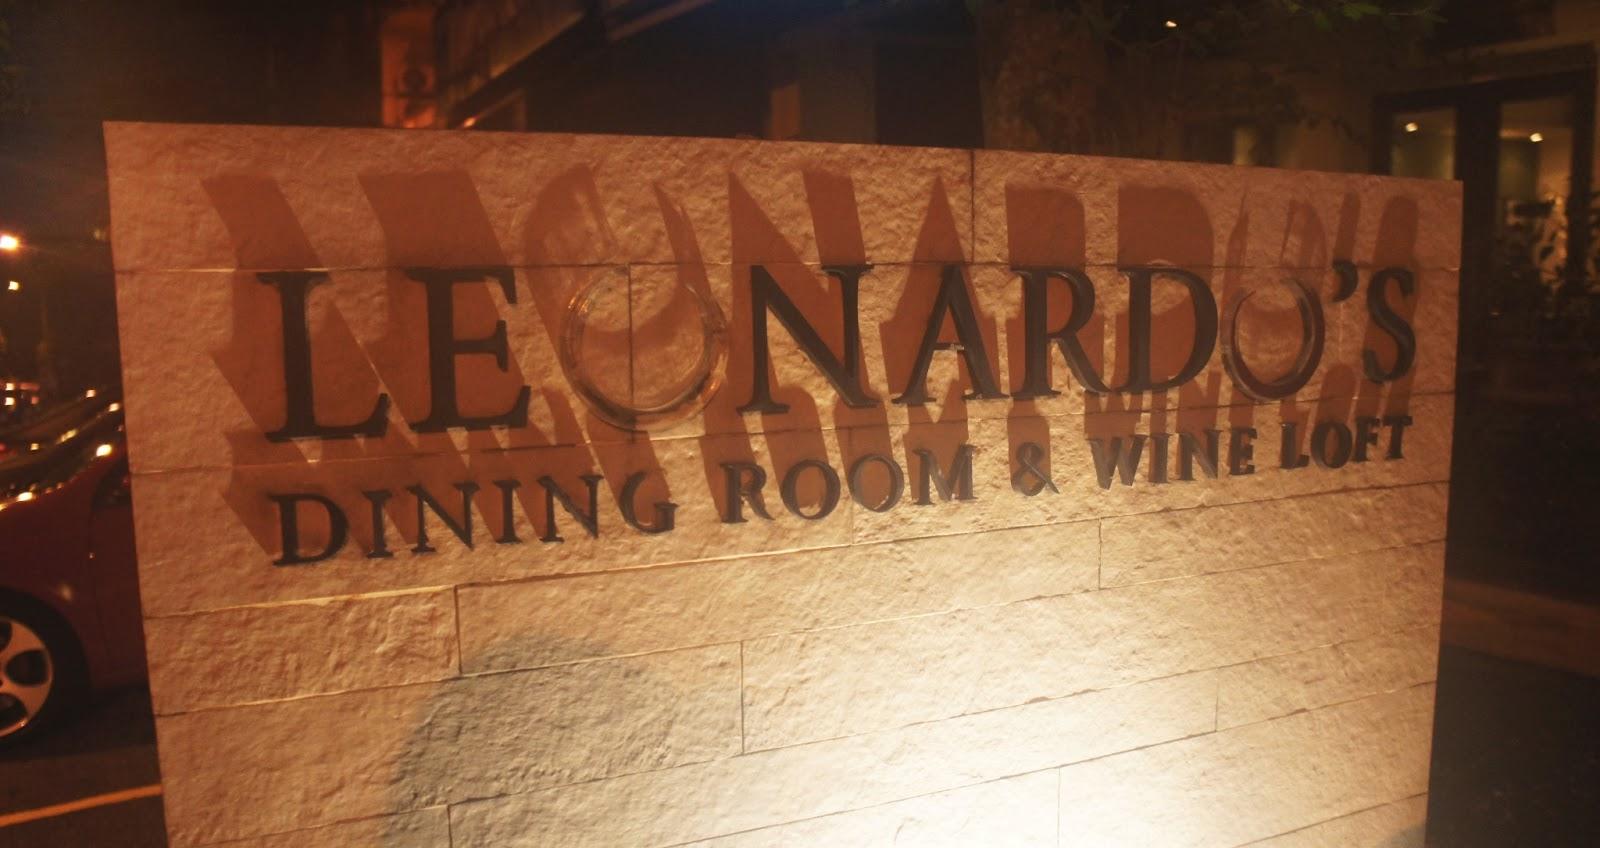 Waiii sek meowsss leonardo 39 s dining room loft bangsar for Leonardo s dining room